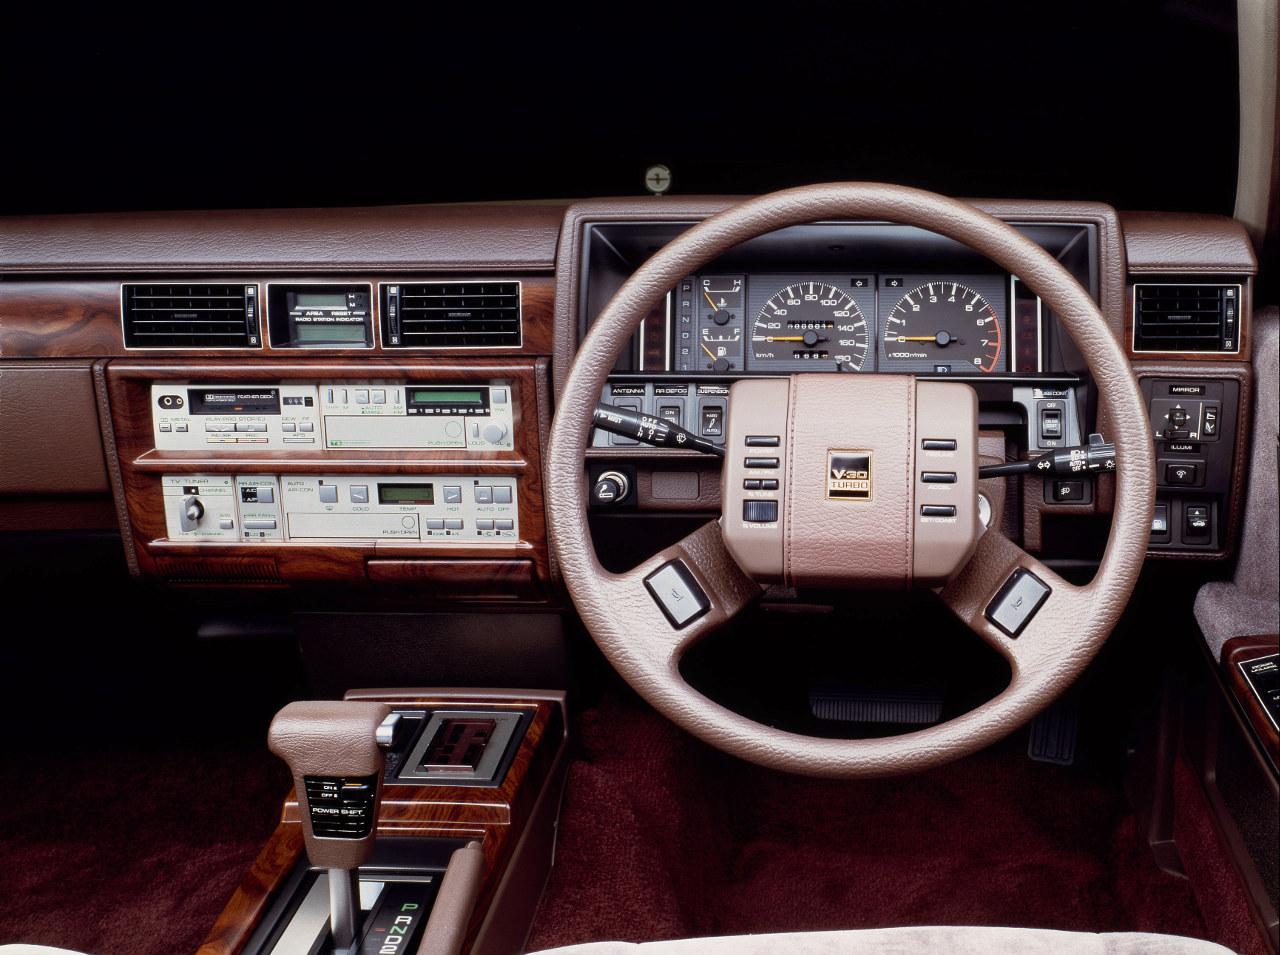 [Image: Nissan%2BGloria%2BHardtop%2B85.jpeg]